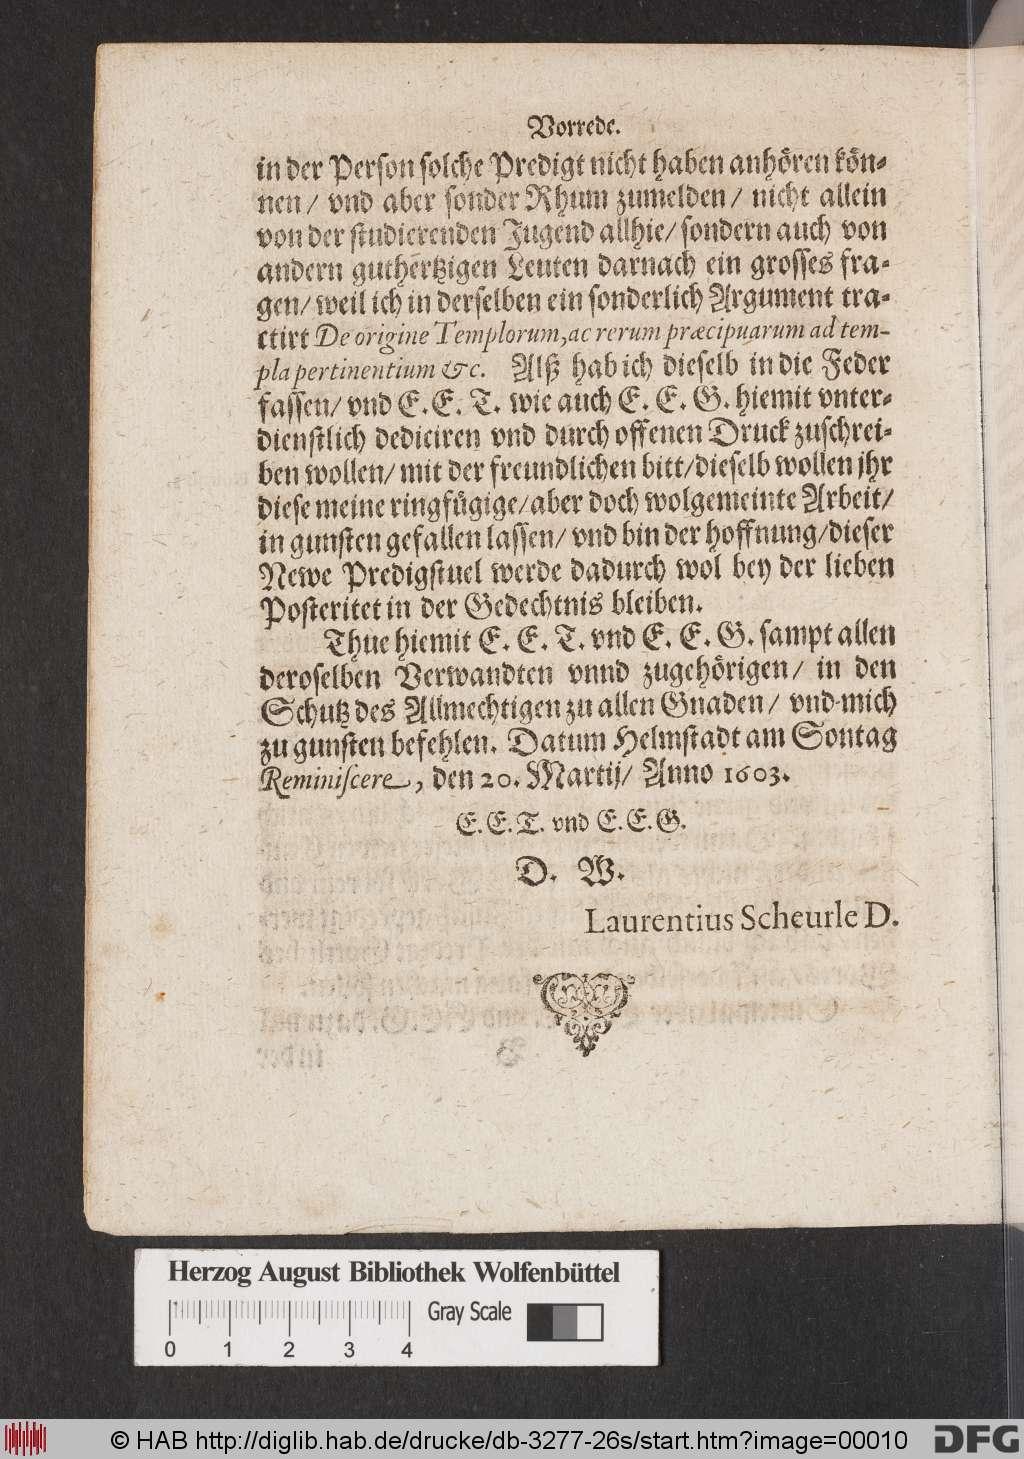 http://diglib.hab.de/drucke/db-3277-26s/00010.jpg